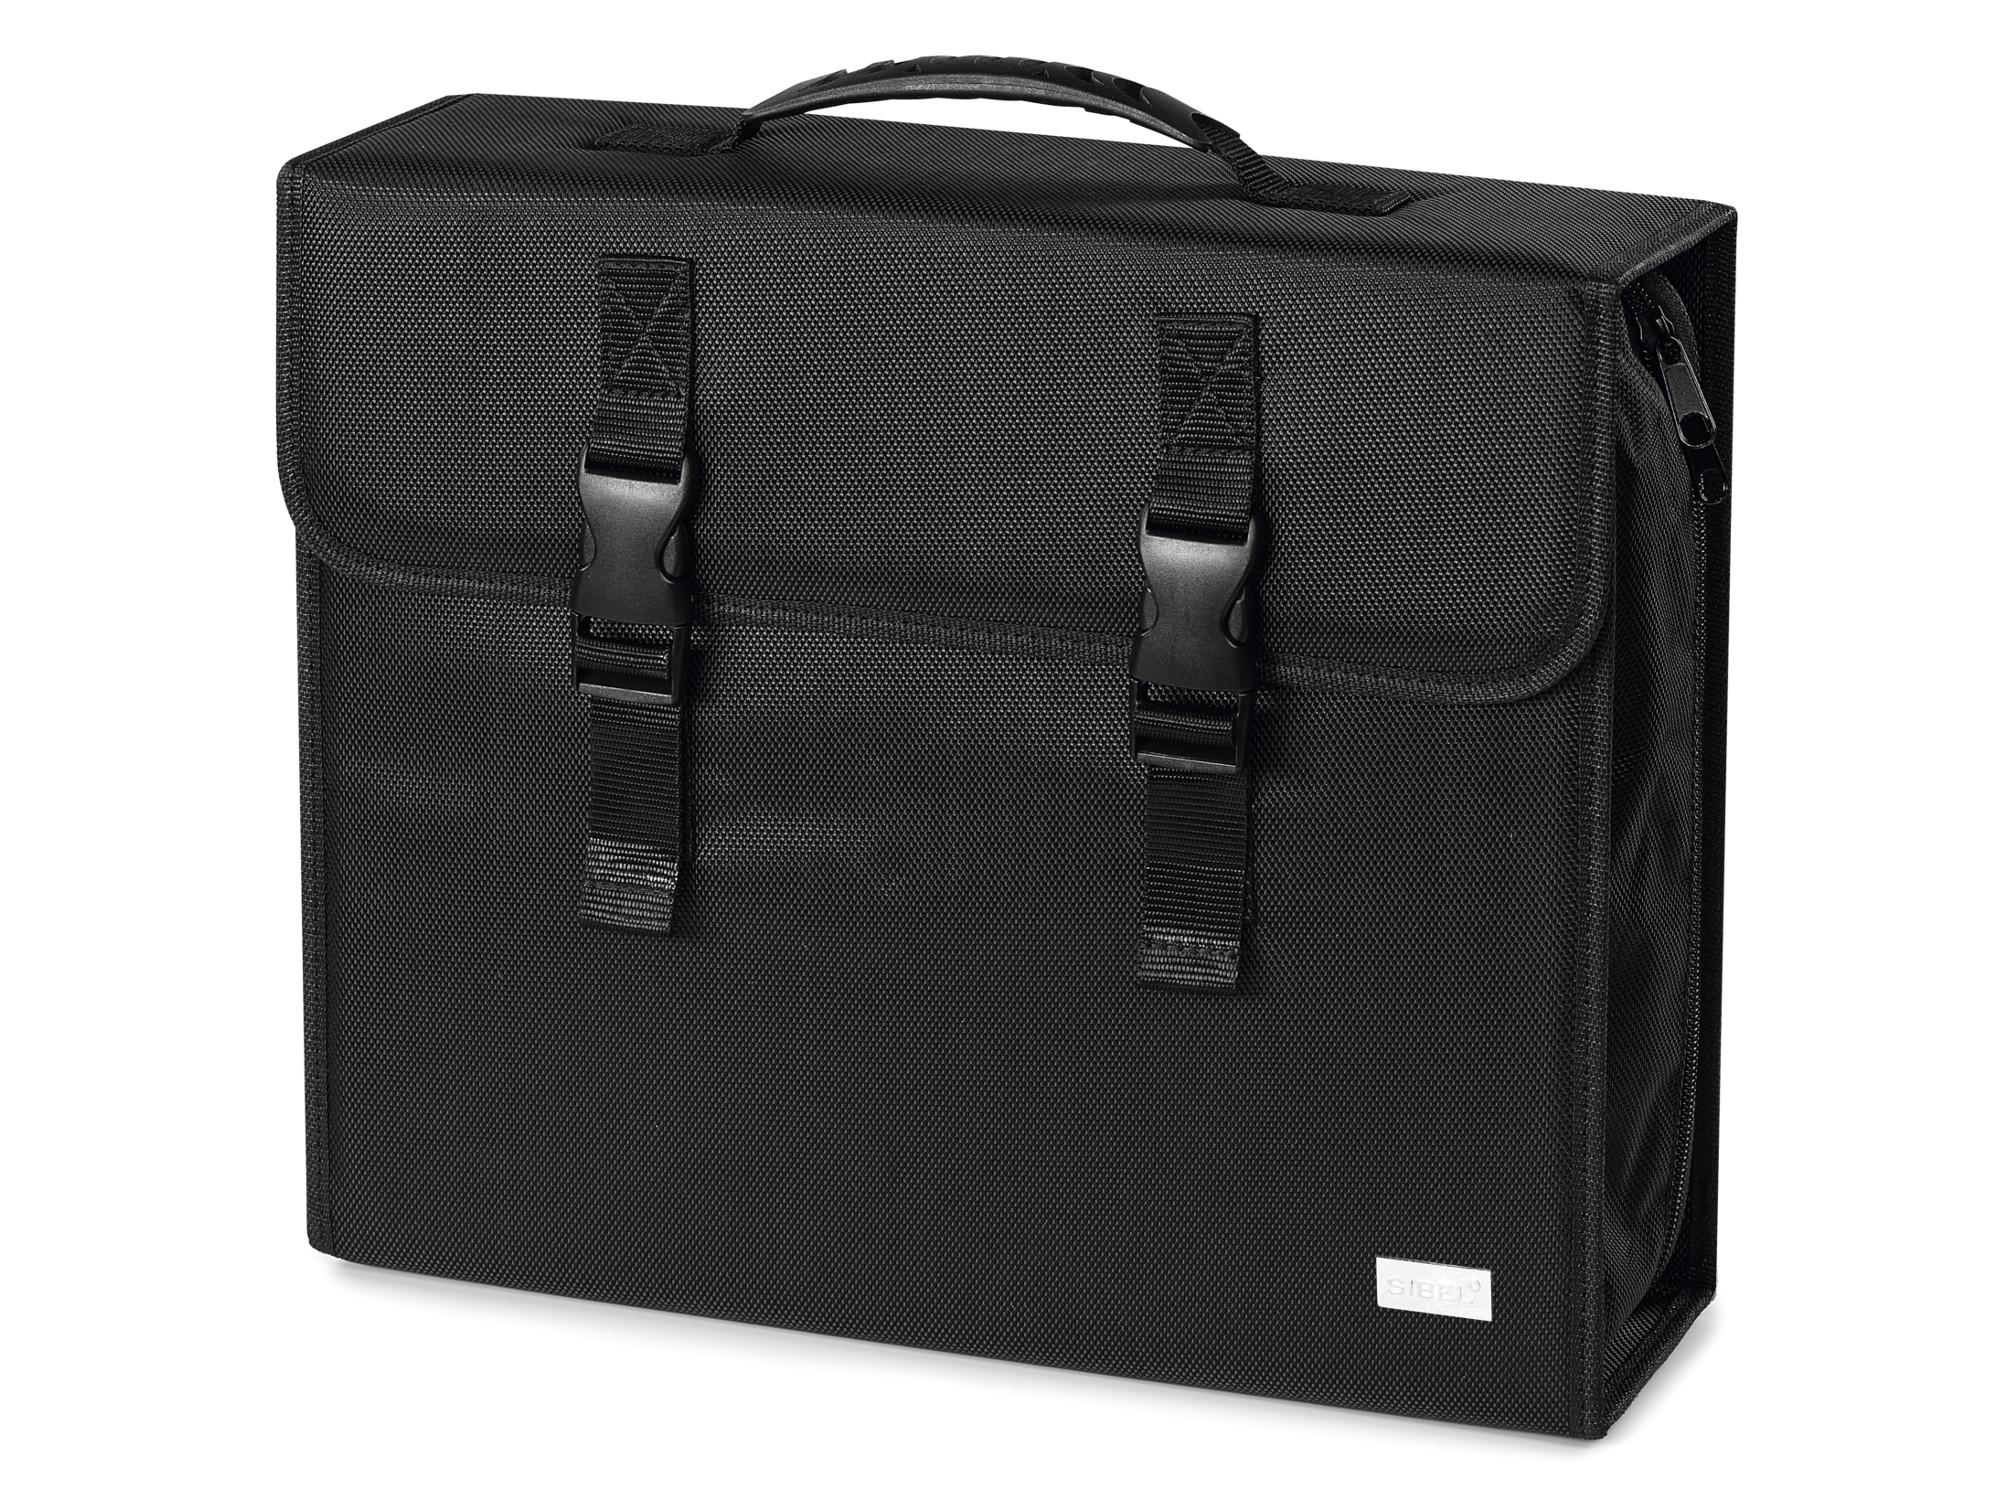 Kadeřnická taška Sibel Y Toolcase se zrcadlem - černá (0130750) + DÁREK ZDARMA